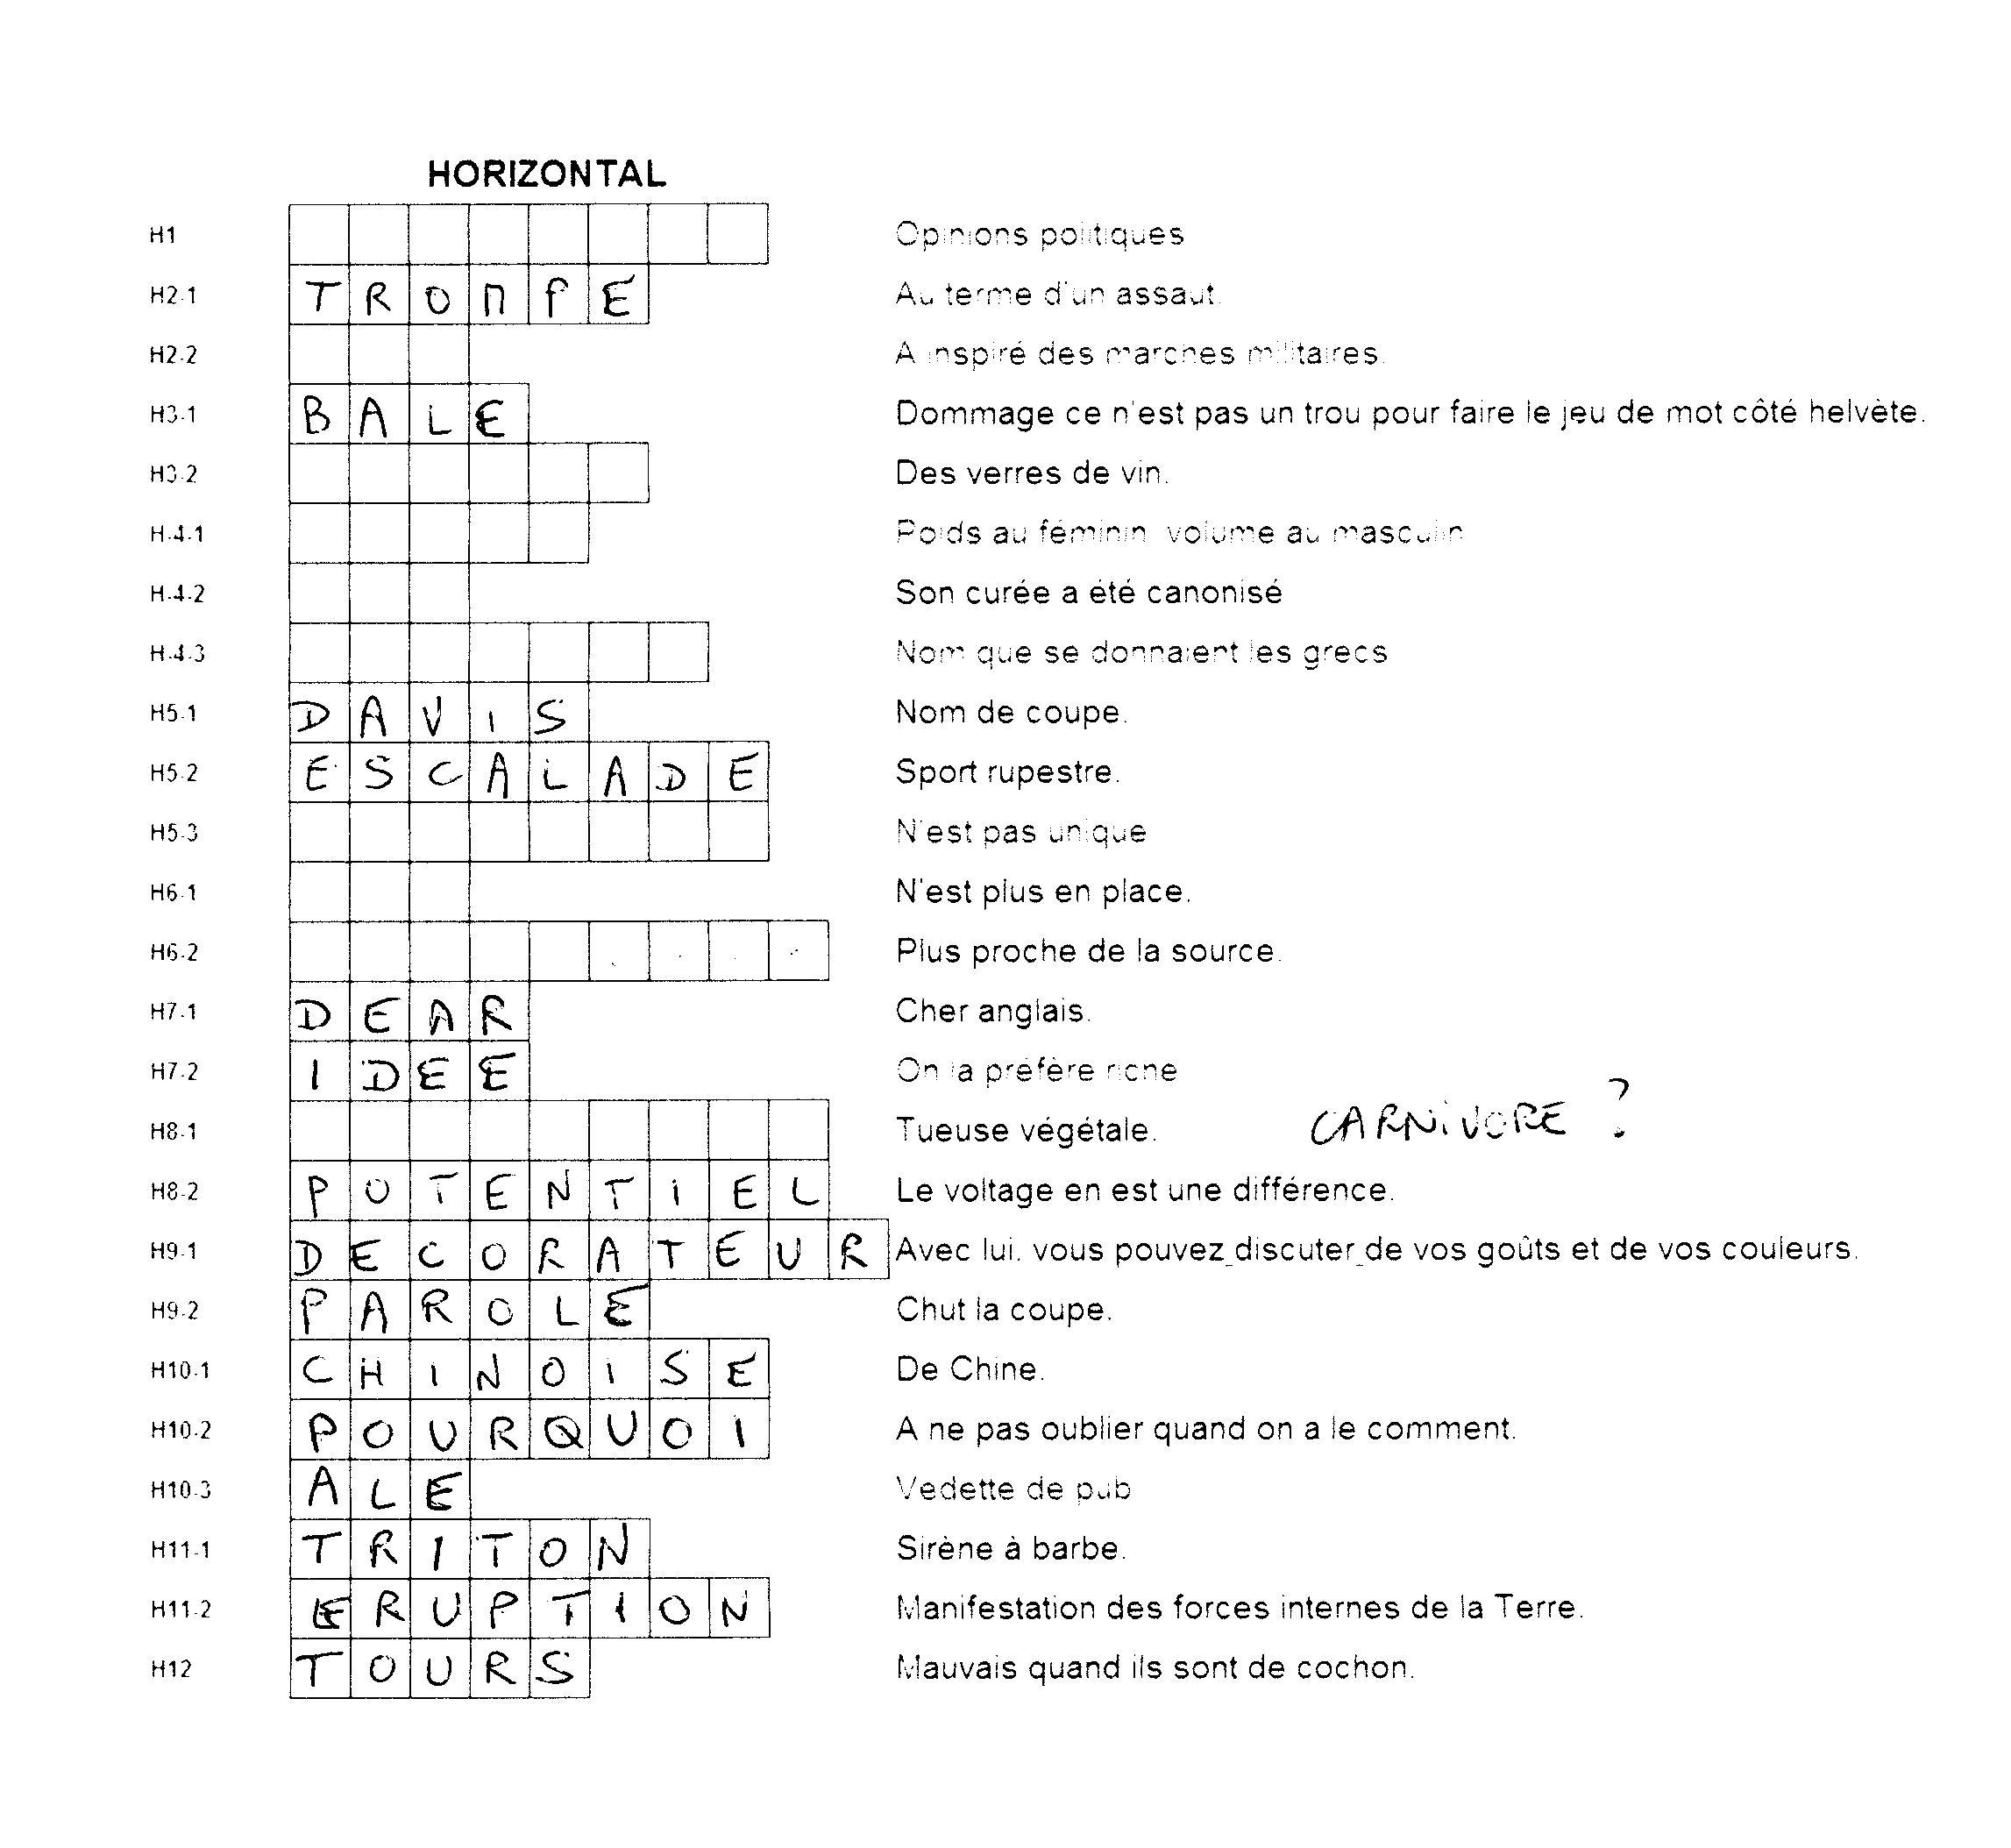 http://www.prise2tete.fr/upload/NickoGecko-DefsCroisees1H.jpg